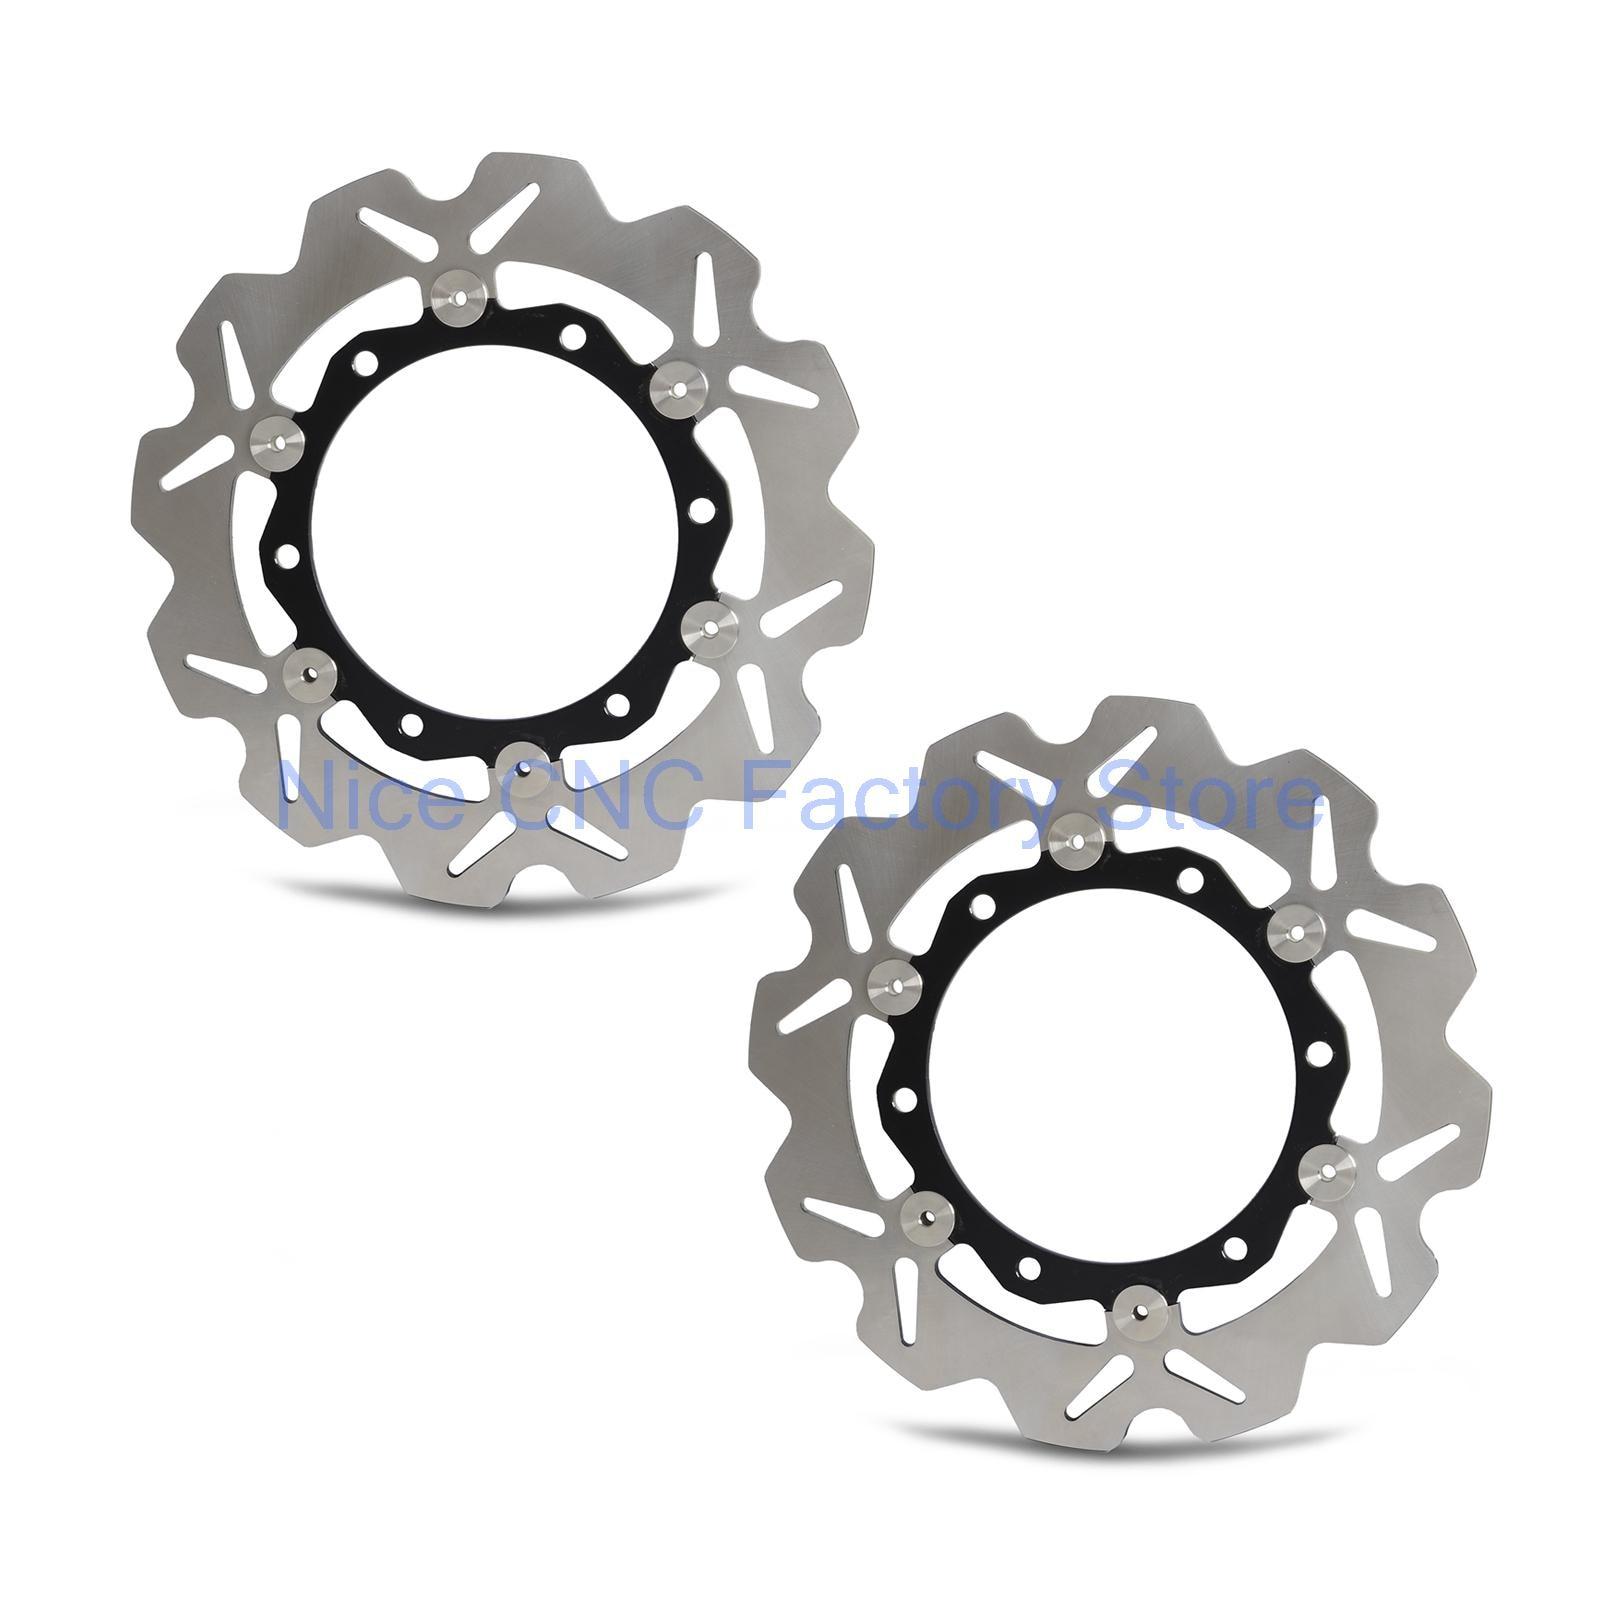 цены на Motorcycle Front  Rotor Brake Disc For Kawasaki ZX6R Ninja ZX12R ZX600 ZR550 ZXR400 GPZ1100 Z750S Z1000 GTR1000 ZZR600 ZR-7S